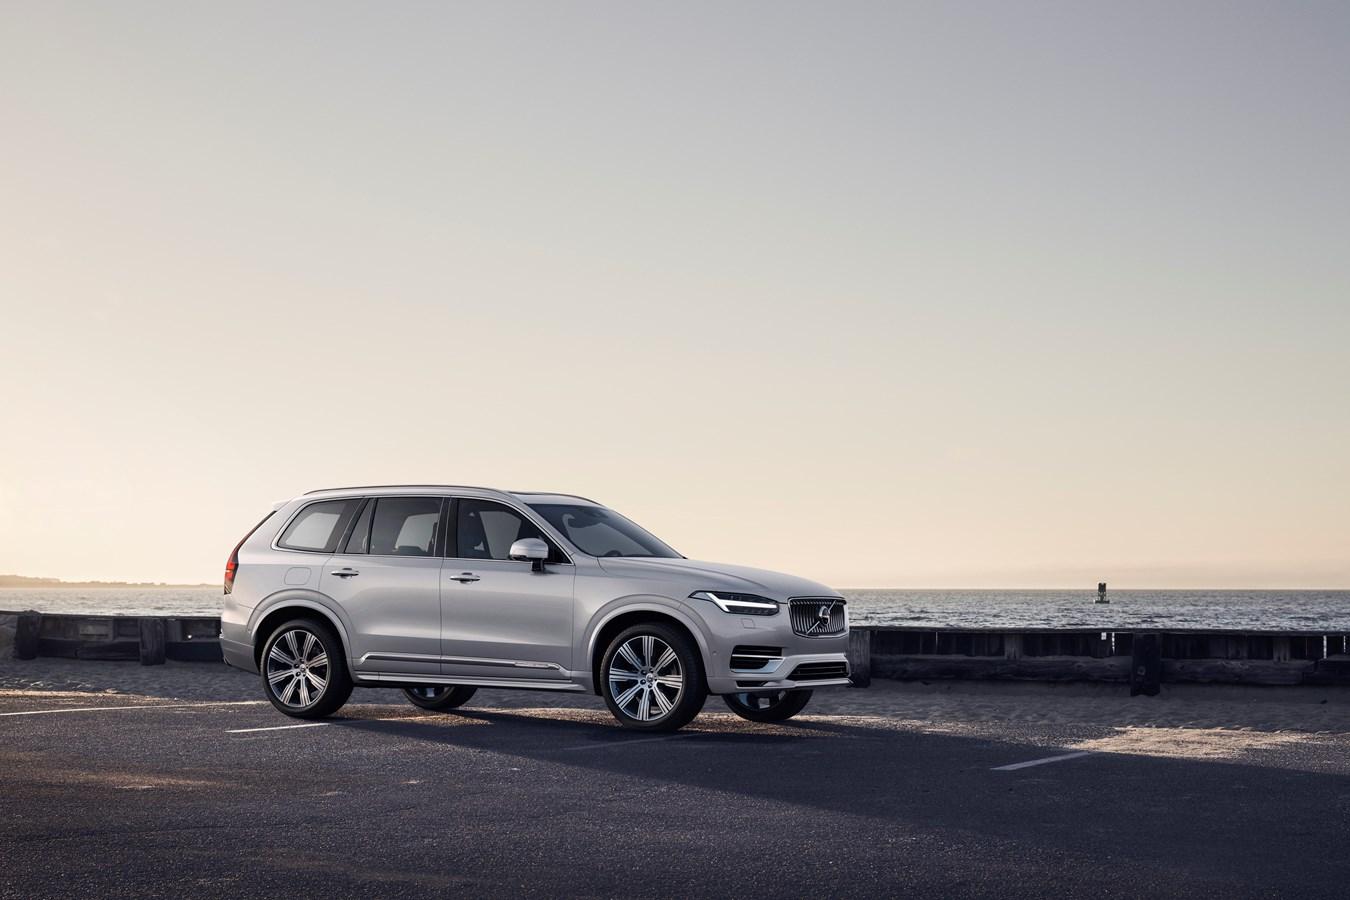 New Volvo XC90 Inscription T8 Twin Engine in Birch Light Metallic